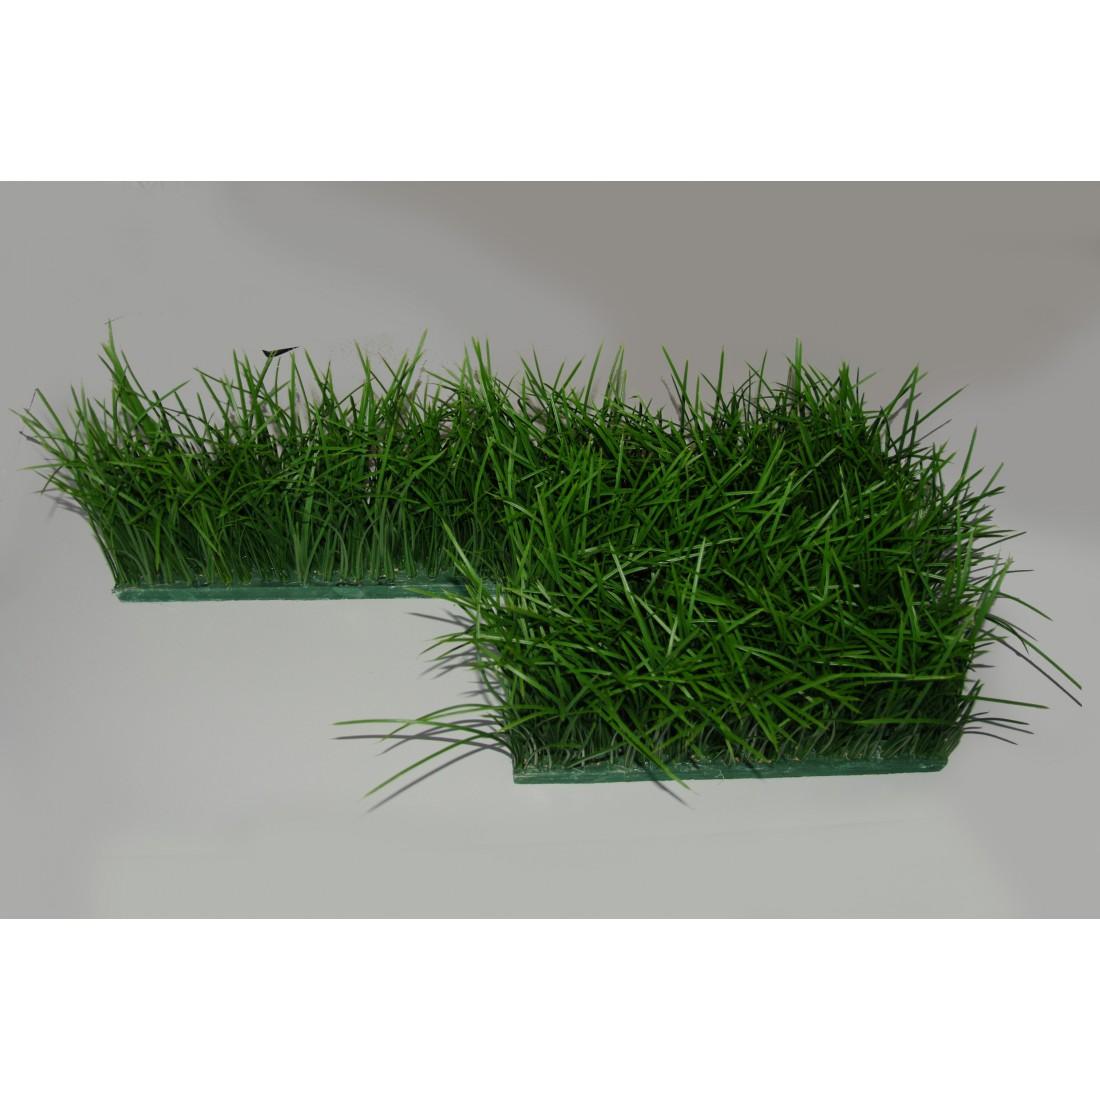 herbe artificielle de pr 20 cm graminees reflets nature lyon. Black Bedroom Furniture Sets. Home Design Ideas